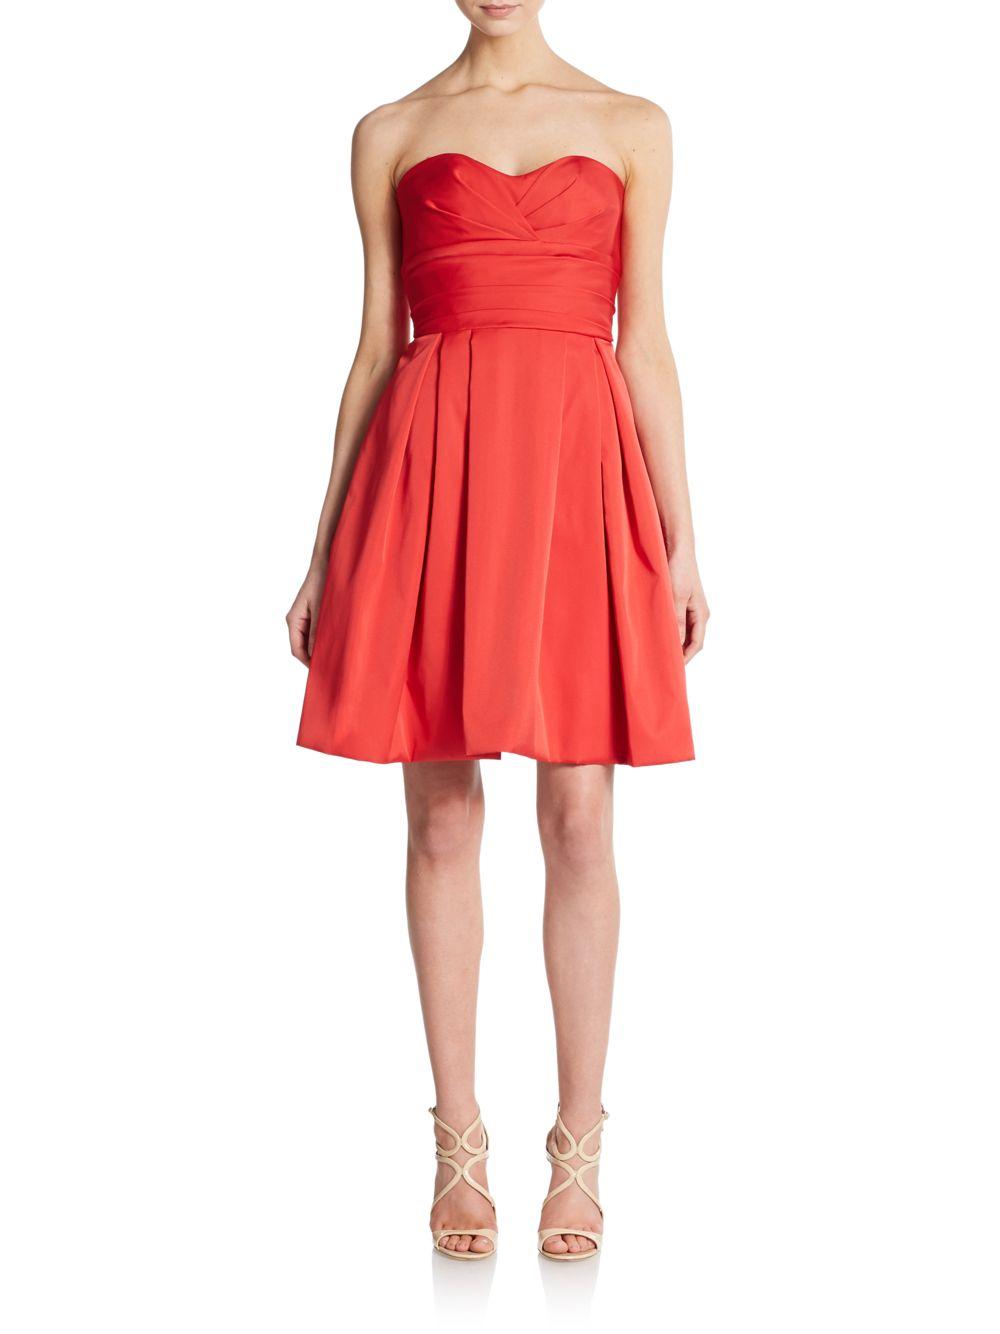 Armani Cocktail Dresses - Homecoming Prom Dresses